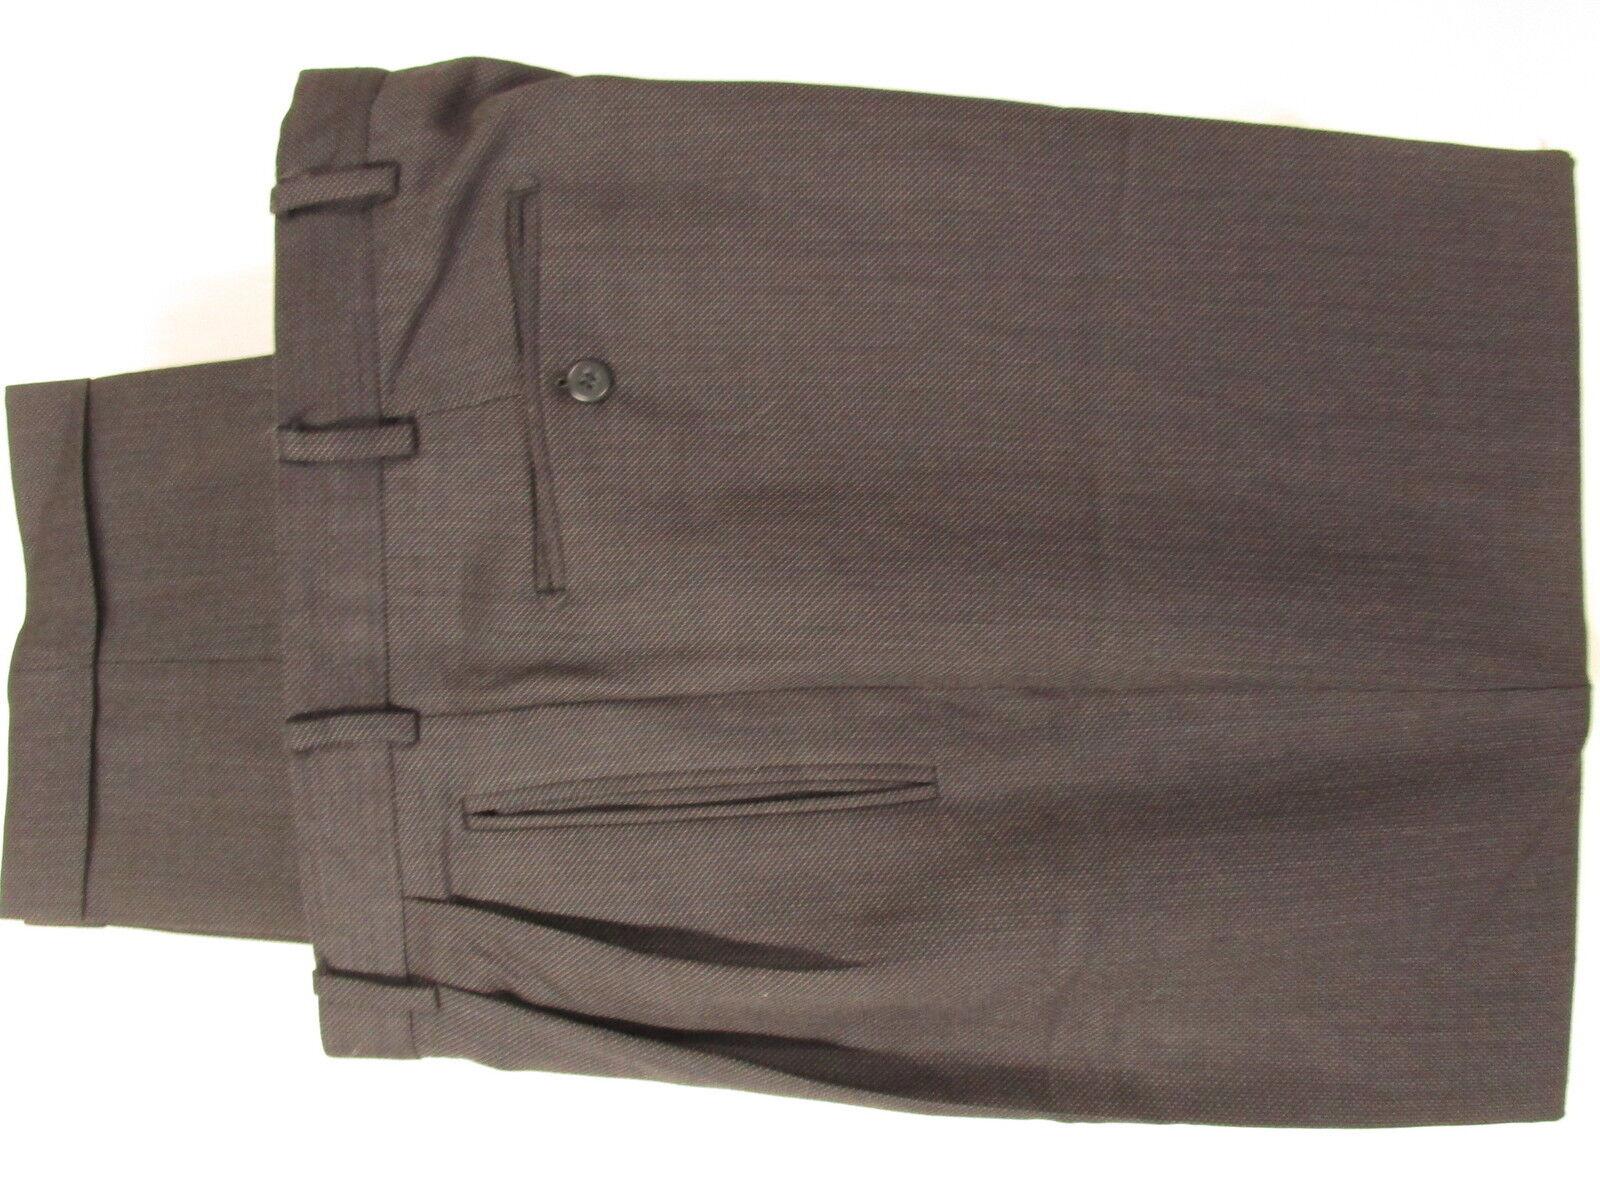 Zanella Duncan Mens Charcoal Pleated Dress Pants Size 34 34x31